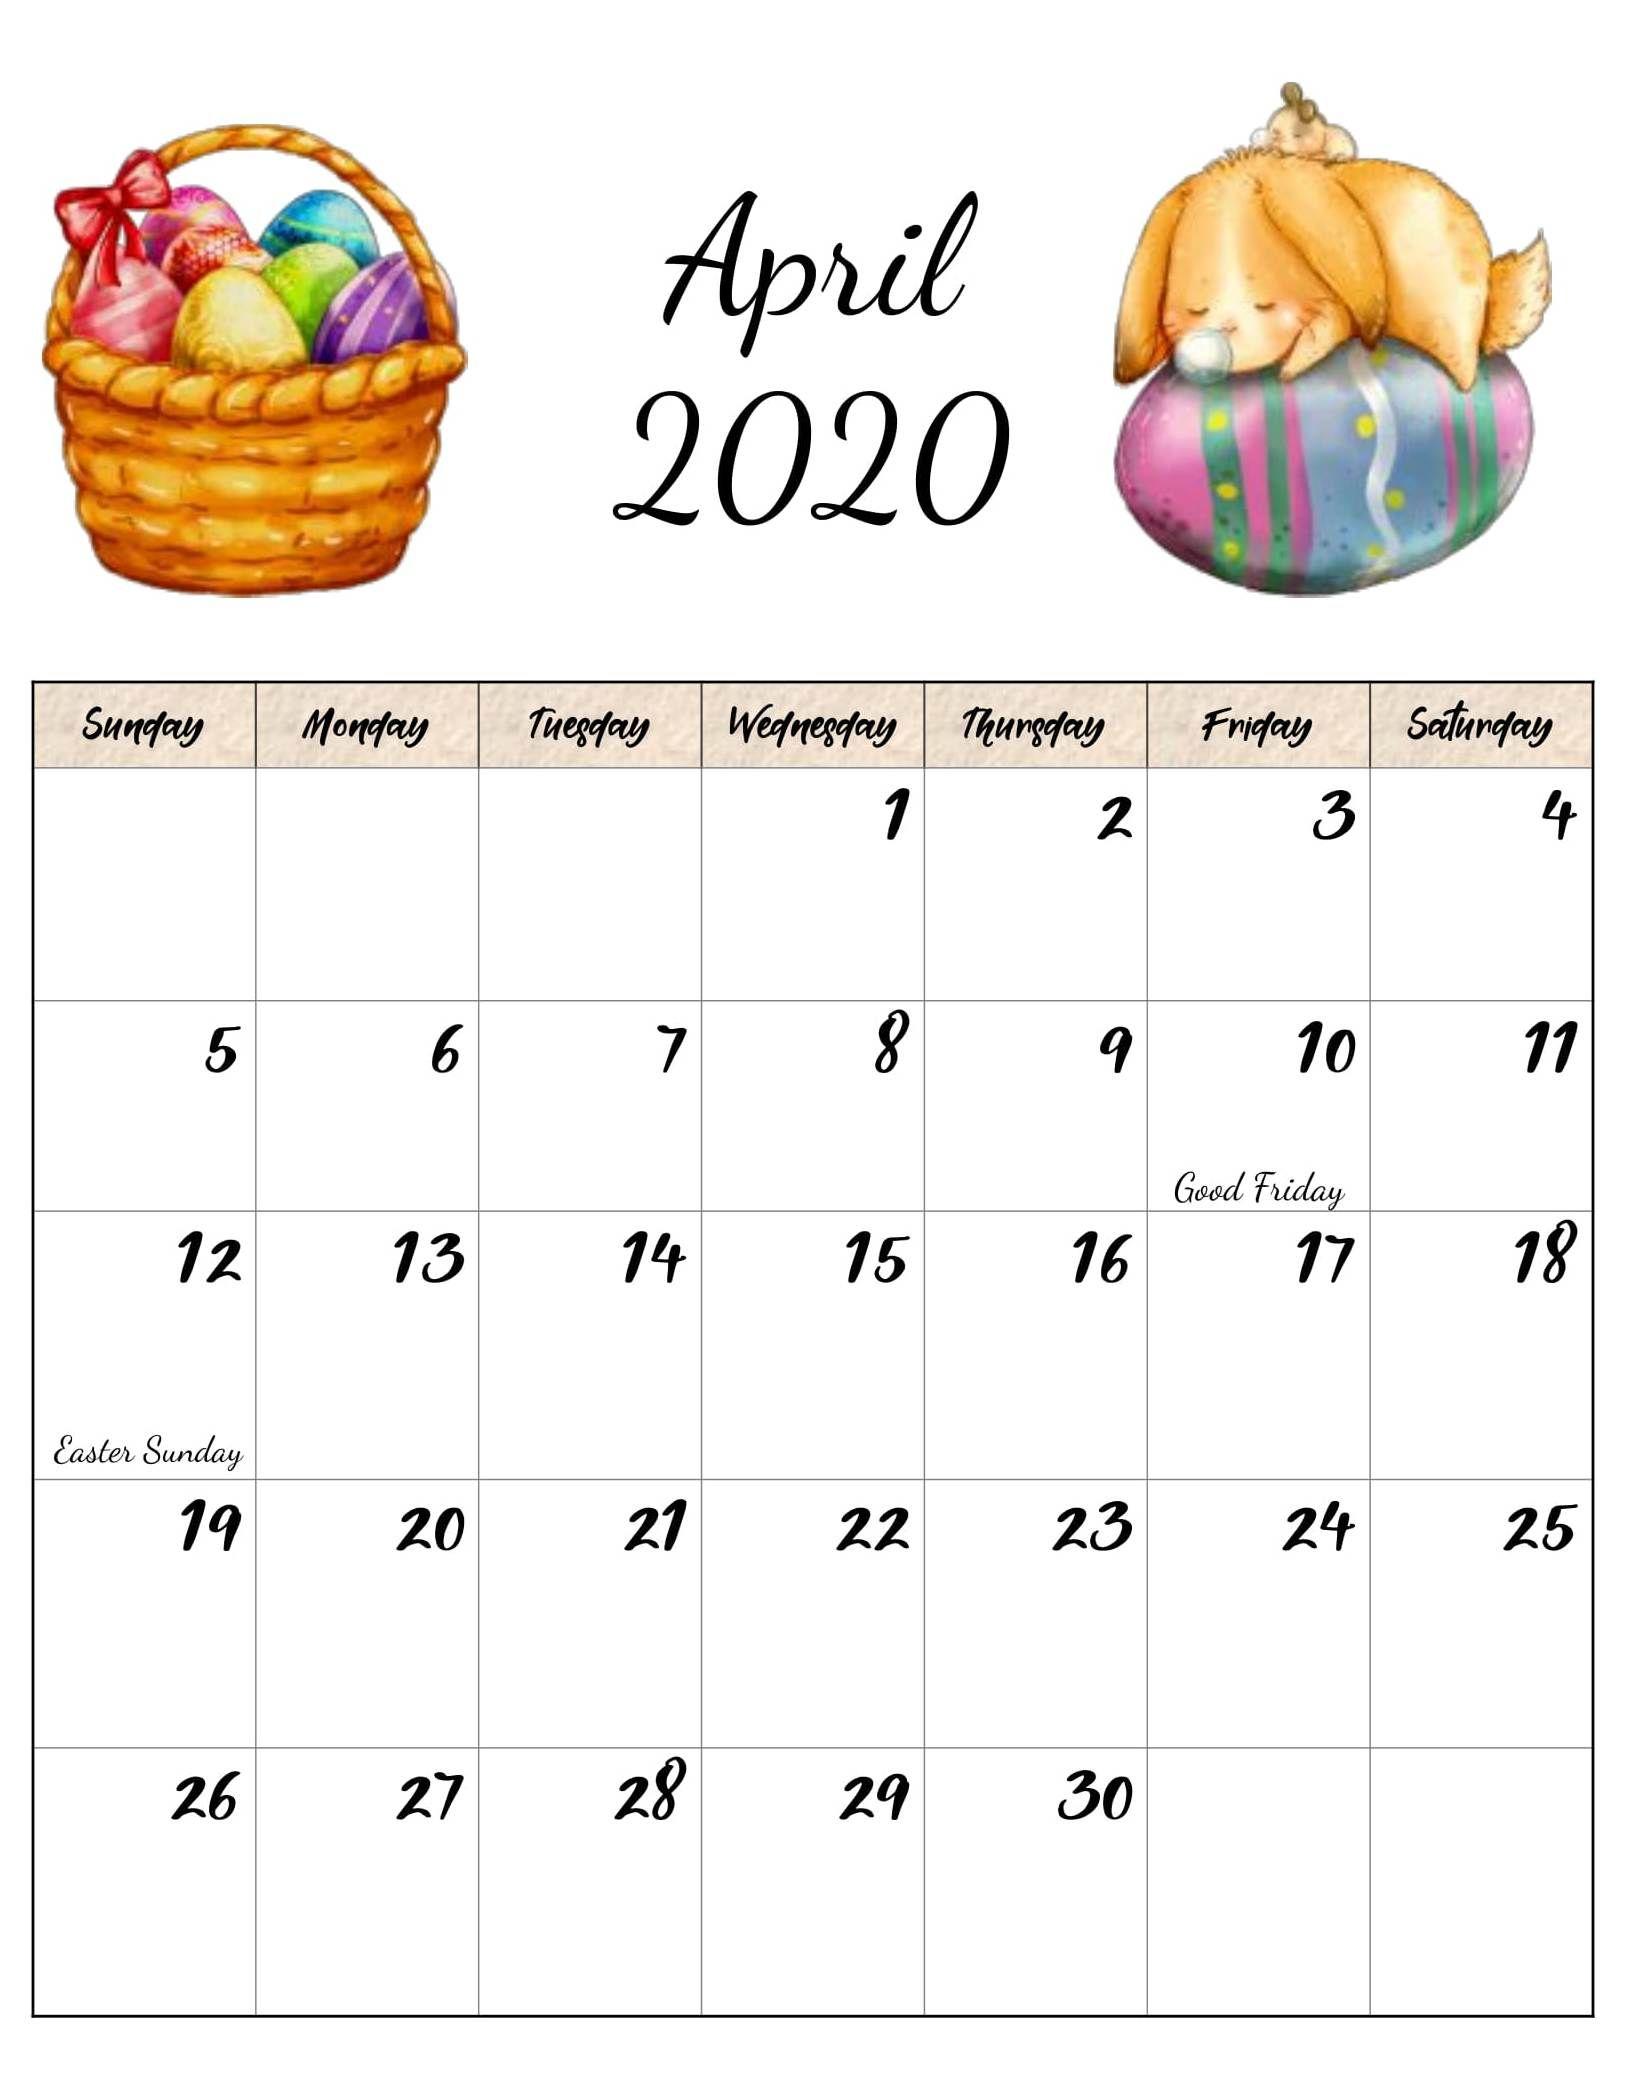 Latest Cute April 2020 Floral Calendar Hd Wallpaper In 2020 2020